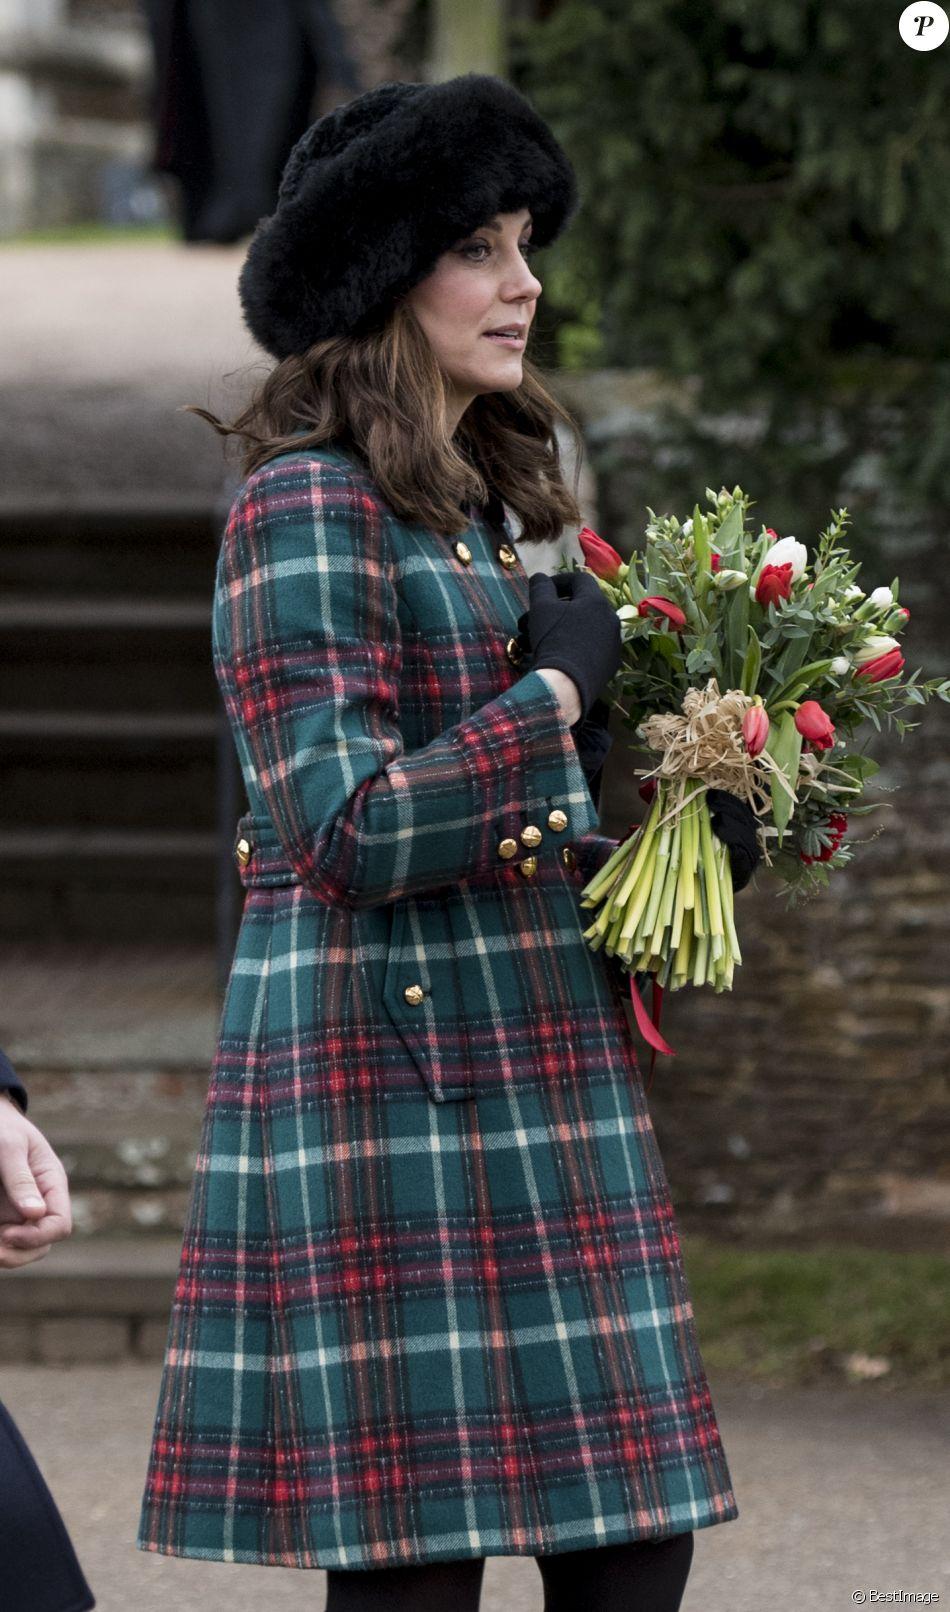 noel 2018 kate middleton Kate Middleton, duchesse de Cambridge, enceinte, a assisté à la  noel 2018 kate middleton